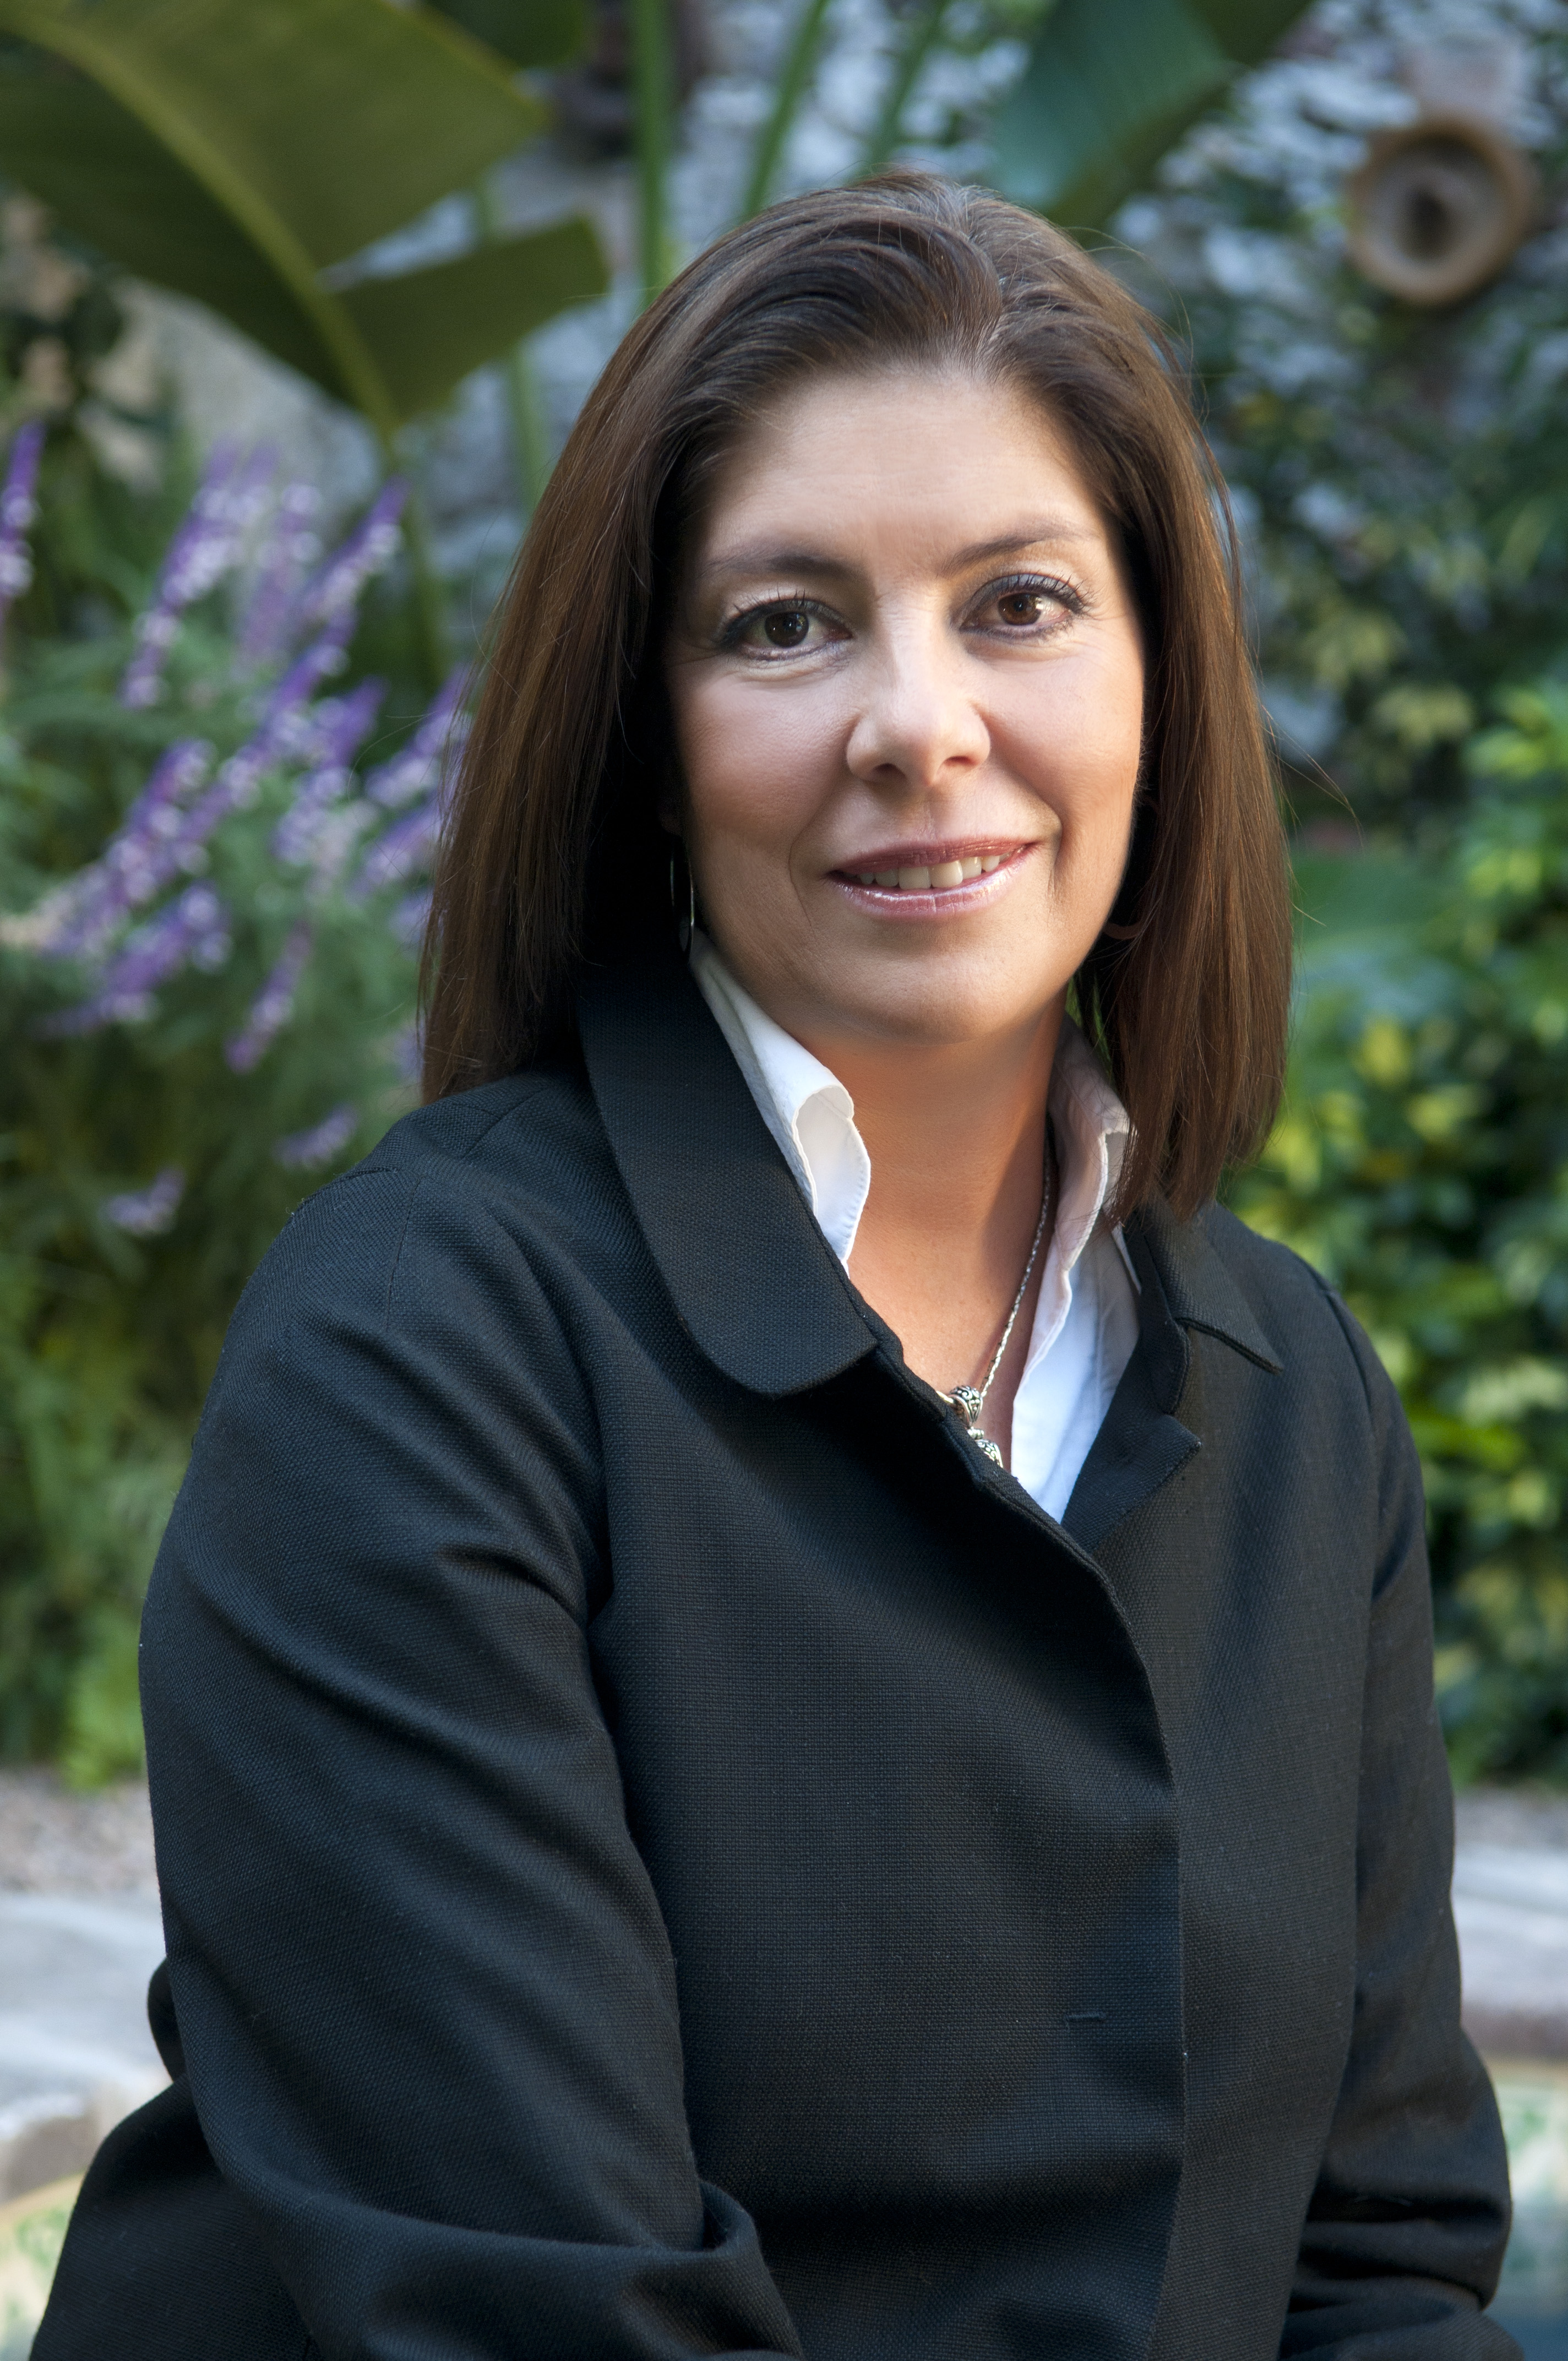 Iliana Suarez